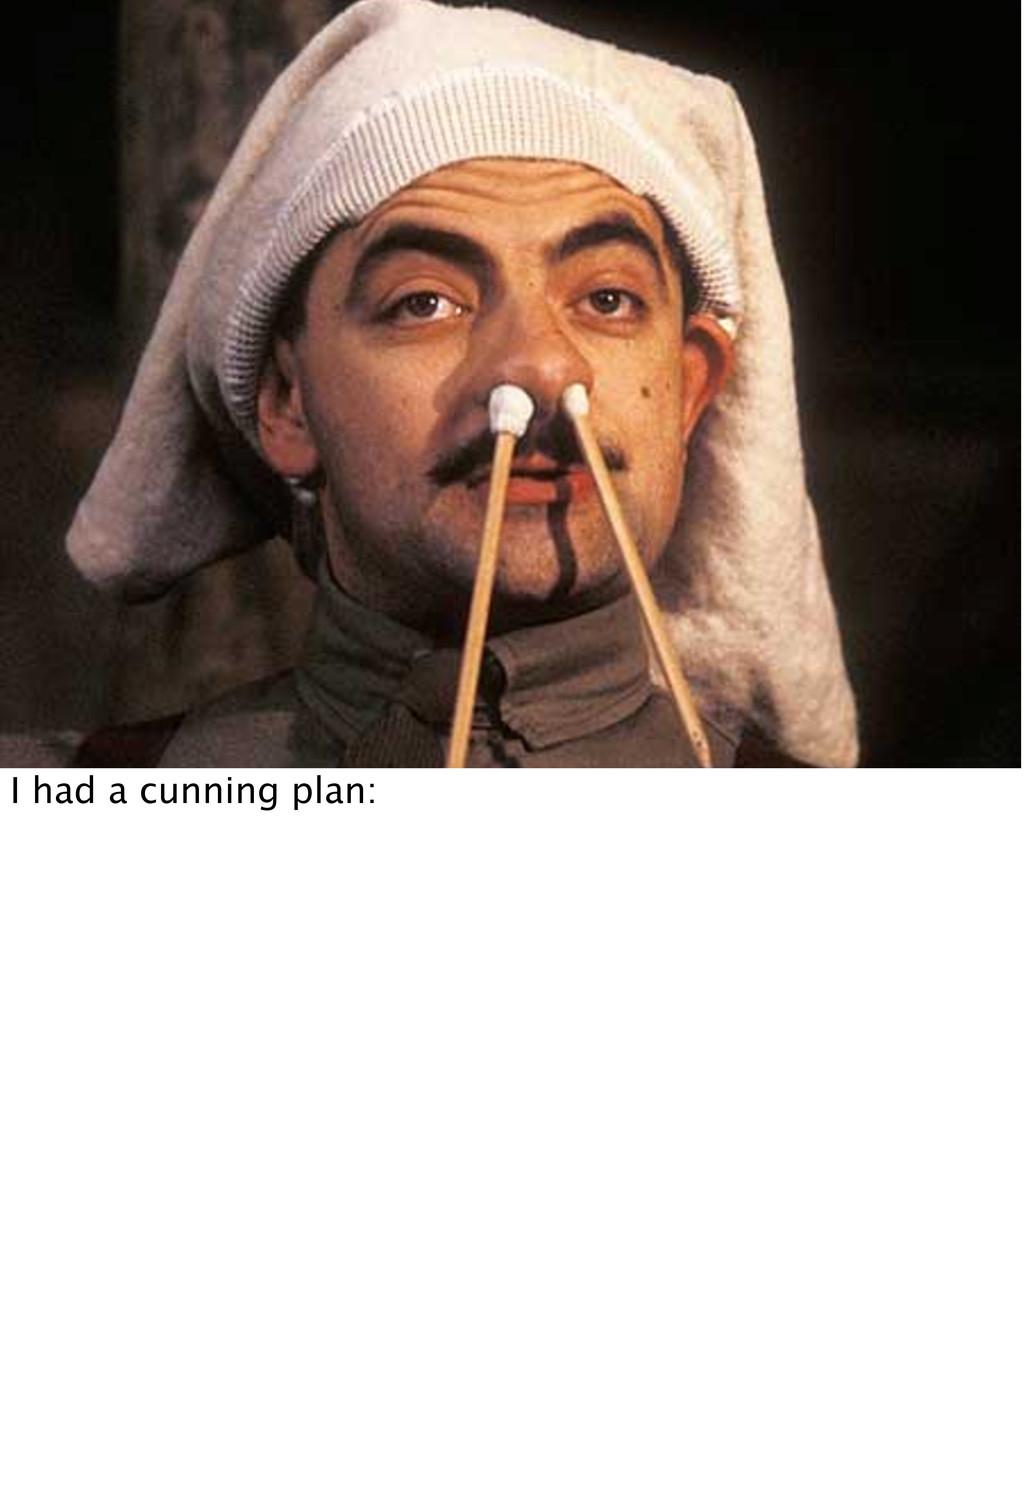 I had a cunning plan: